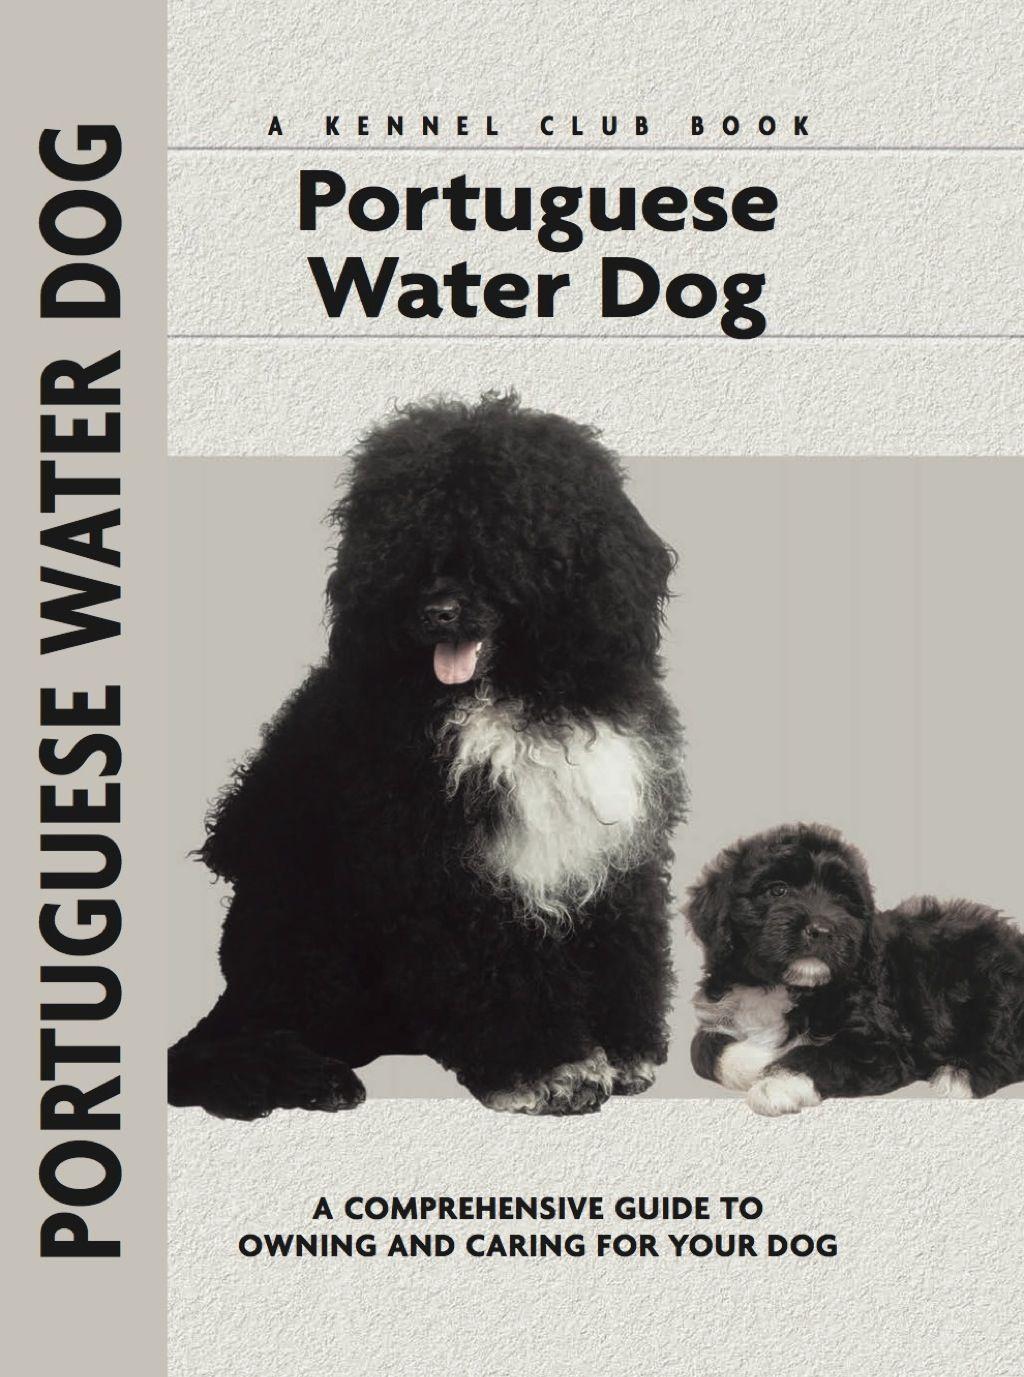 Portuguese Water Dog Ebook Portuguese Water Dog Dogs Dog Books